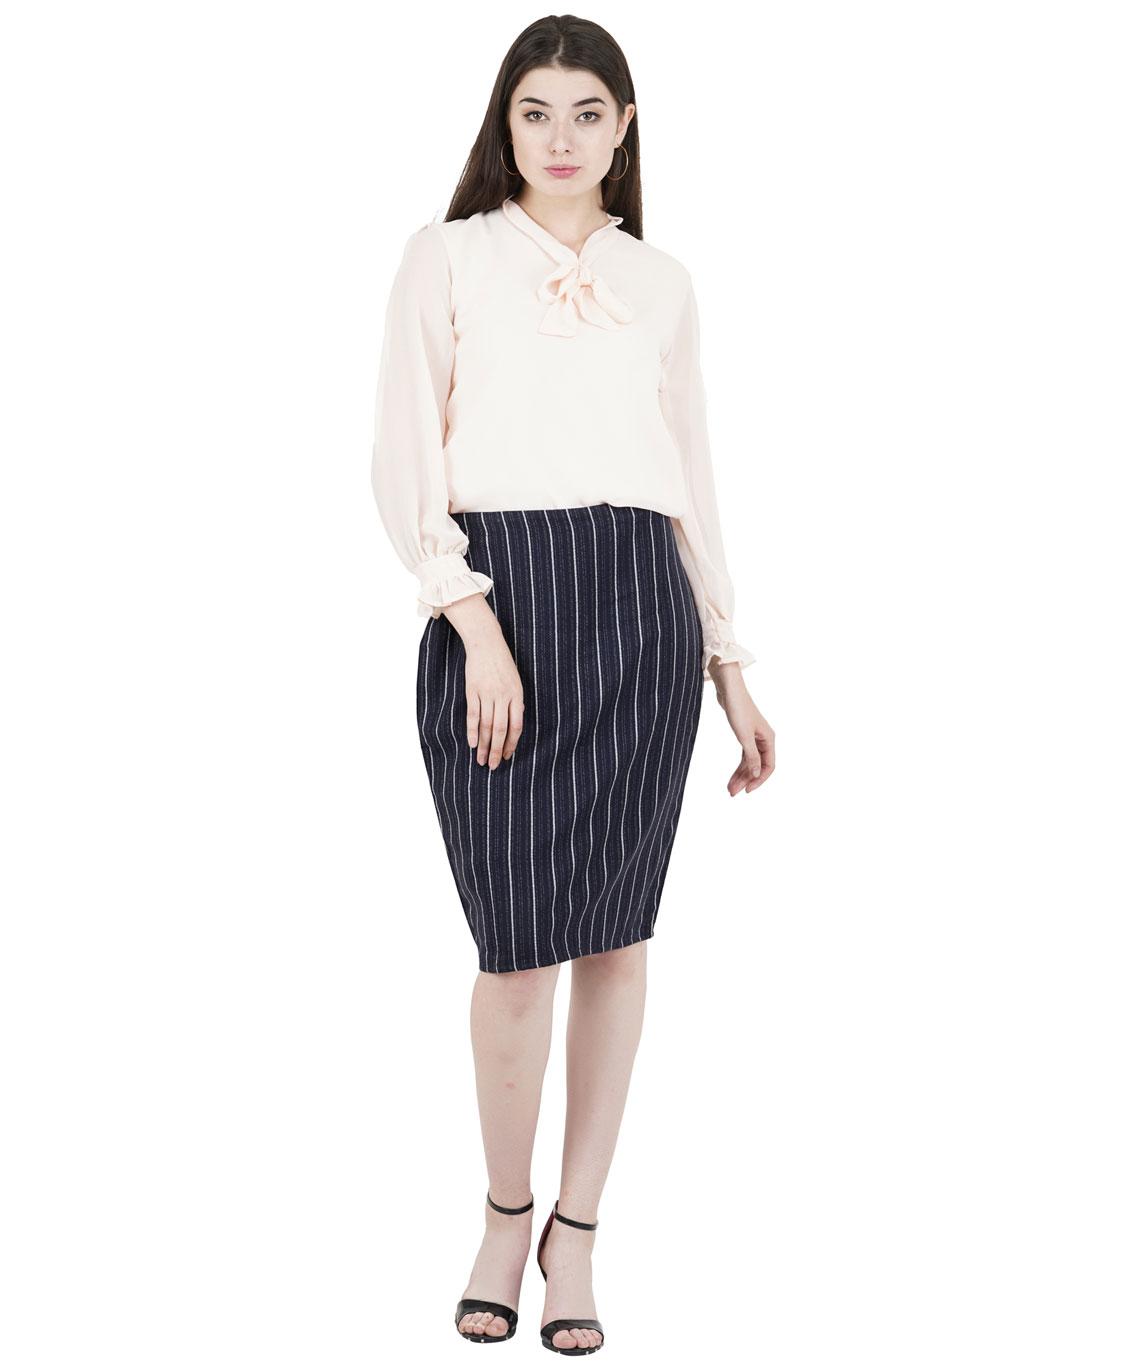 Clothsey Women`s Skirt